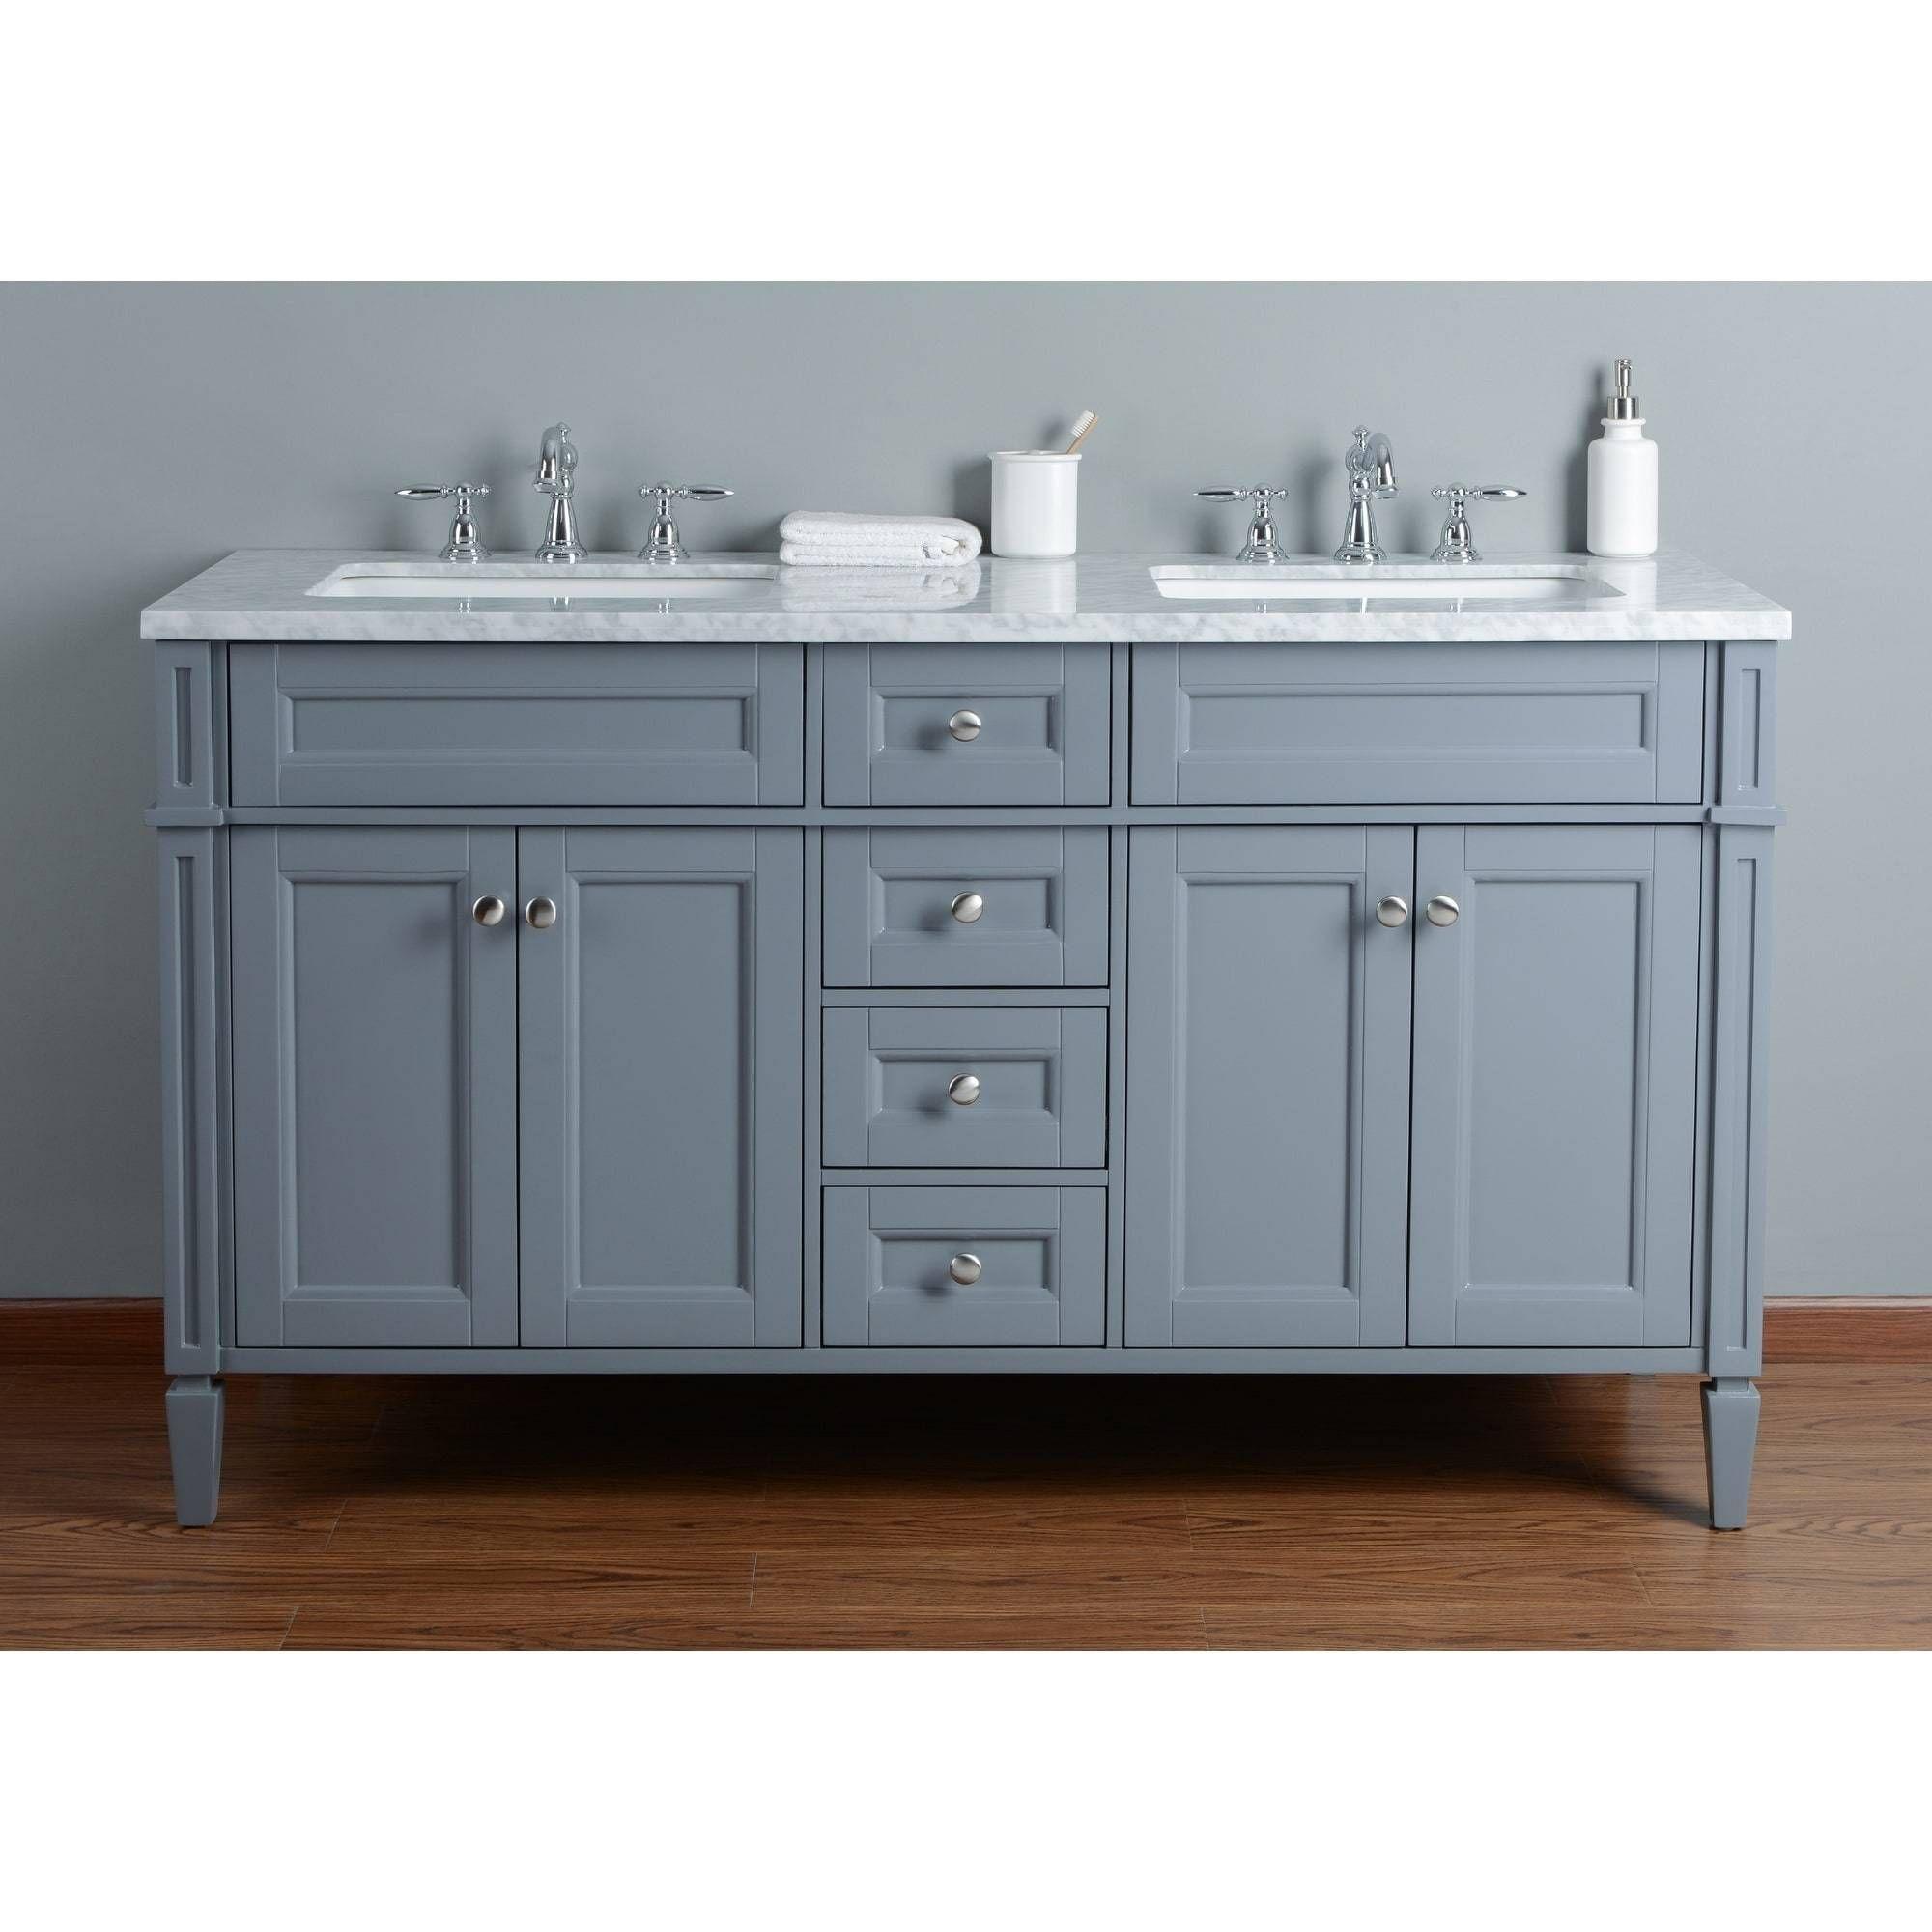 60 inch wide Grey Double Sink Transitional Bathroom Vanity ...